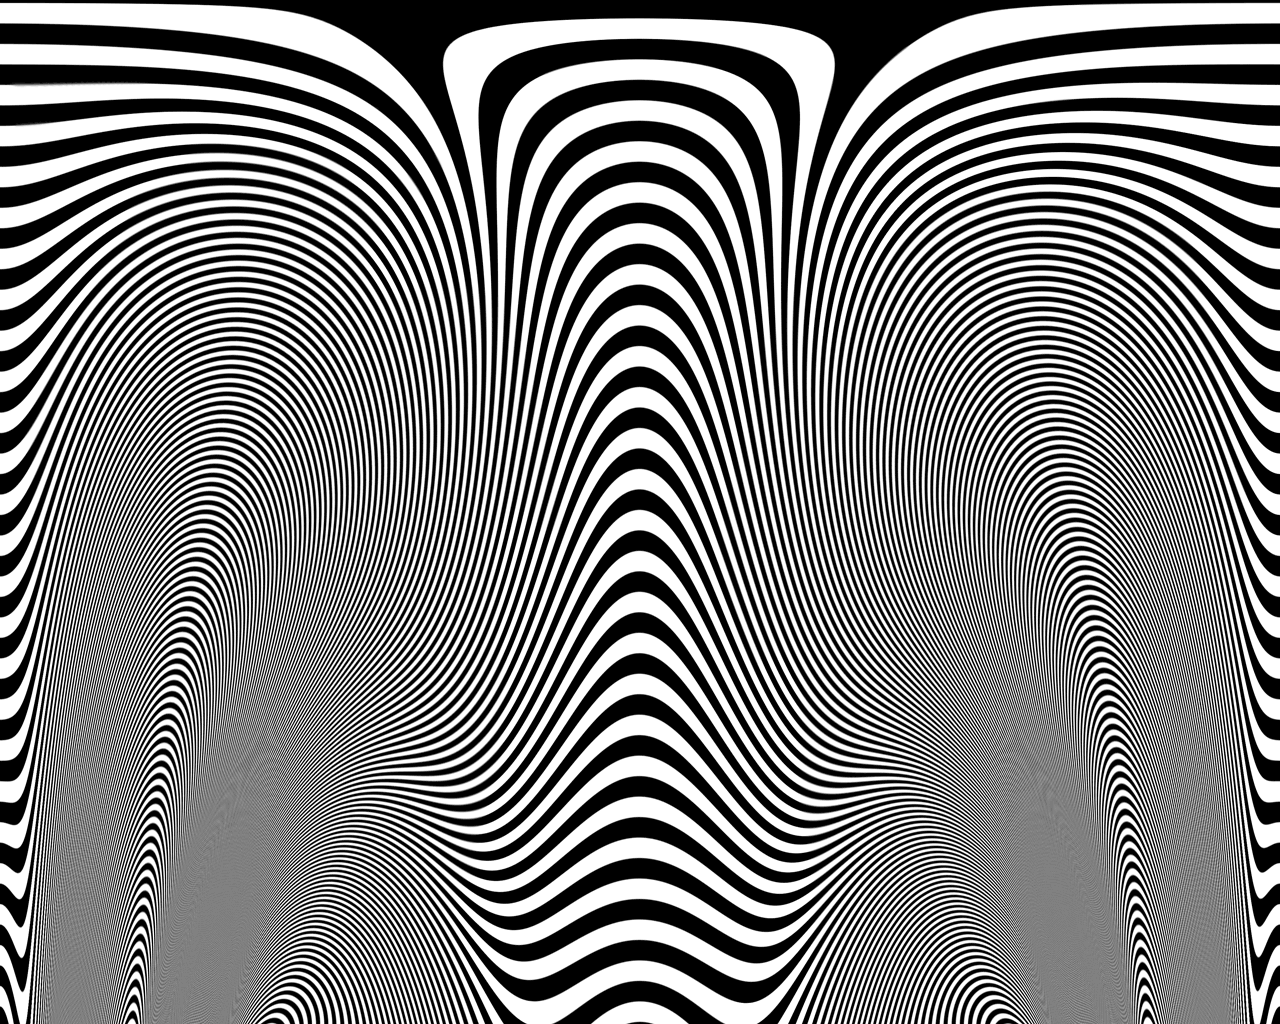 Zebra skin - photo#13